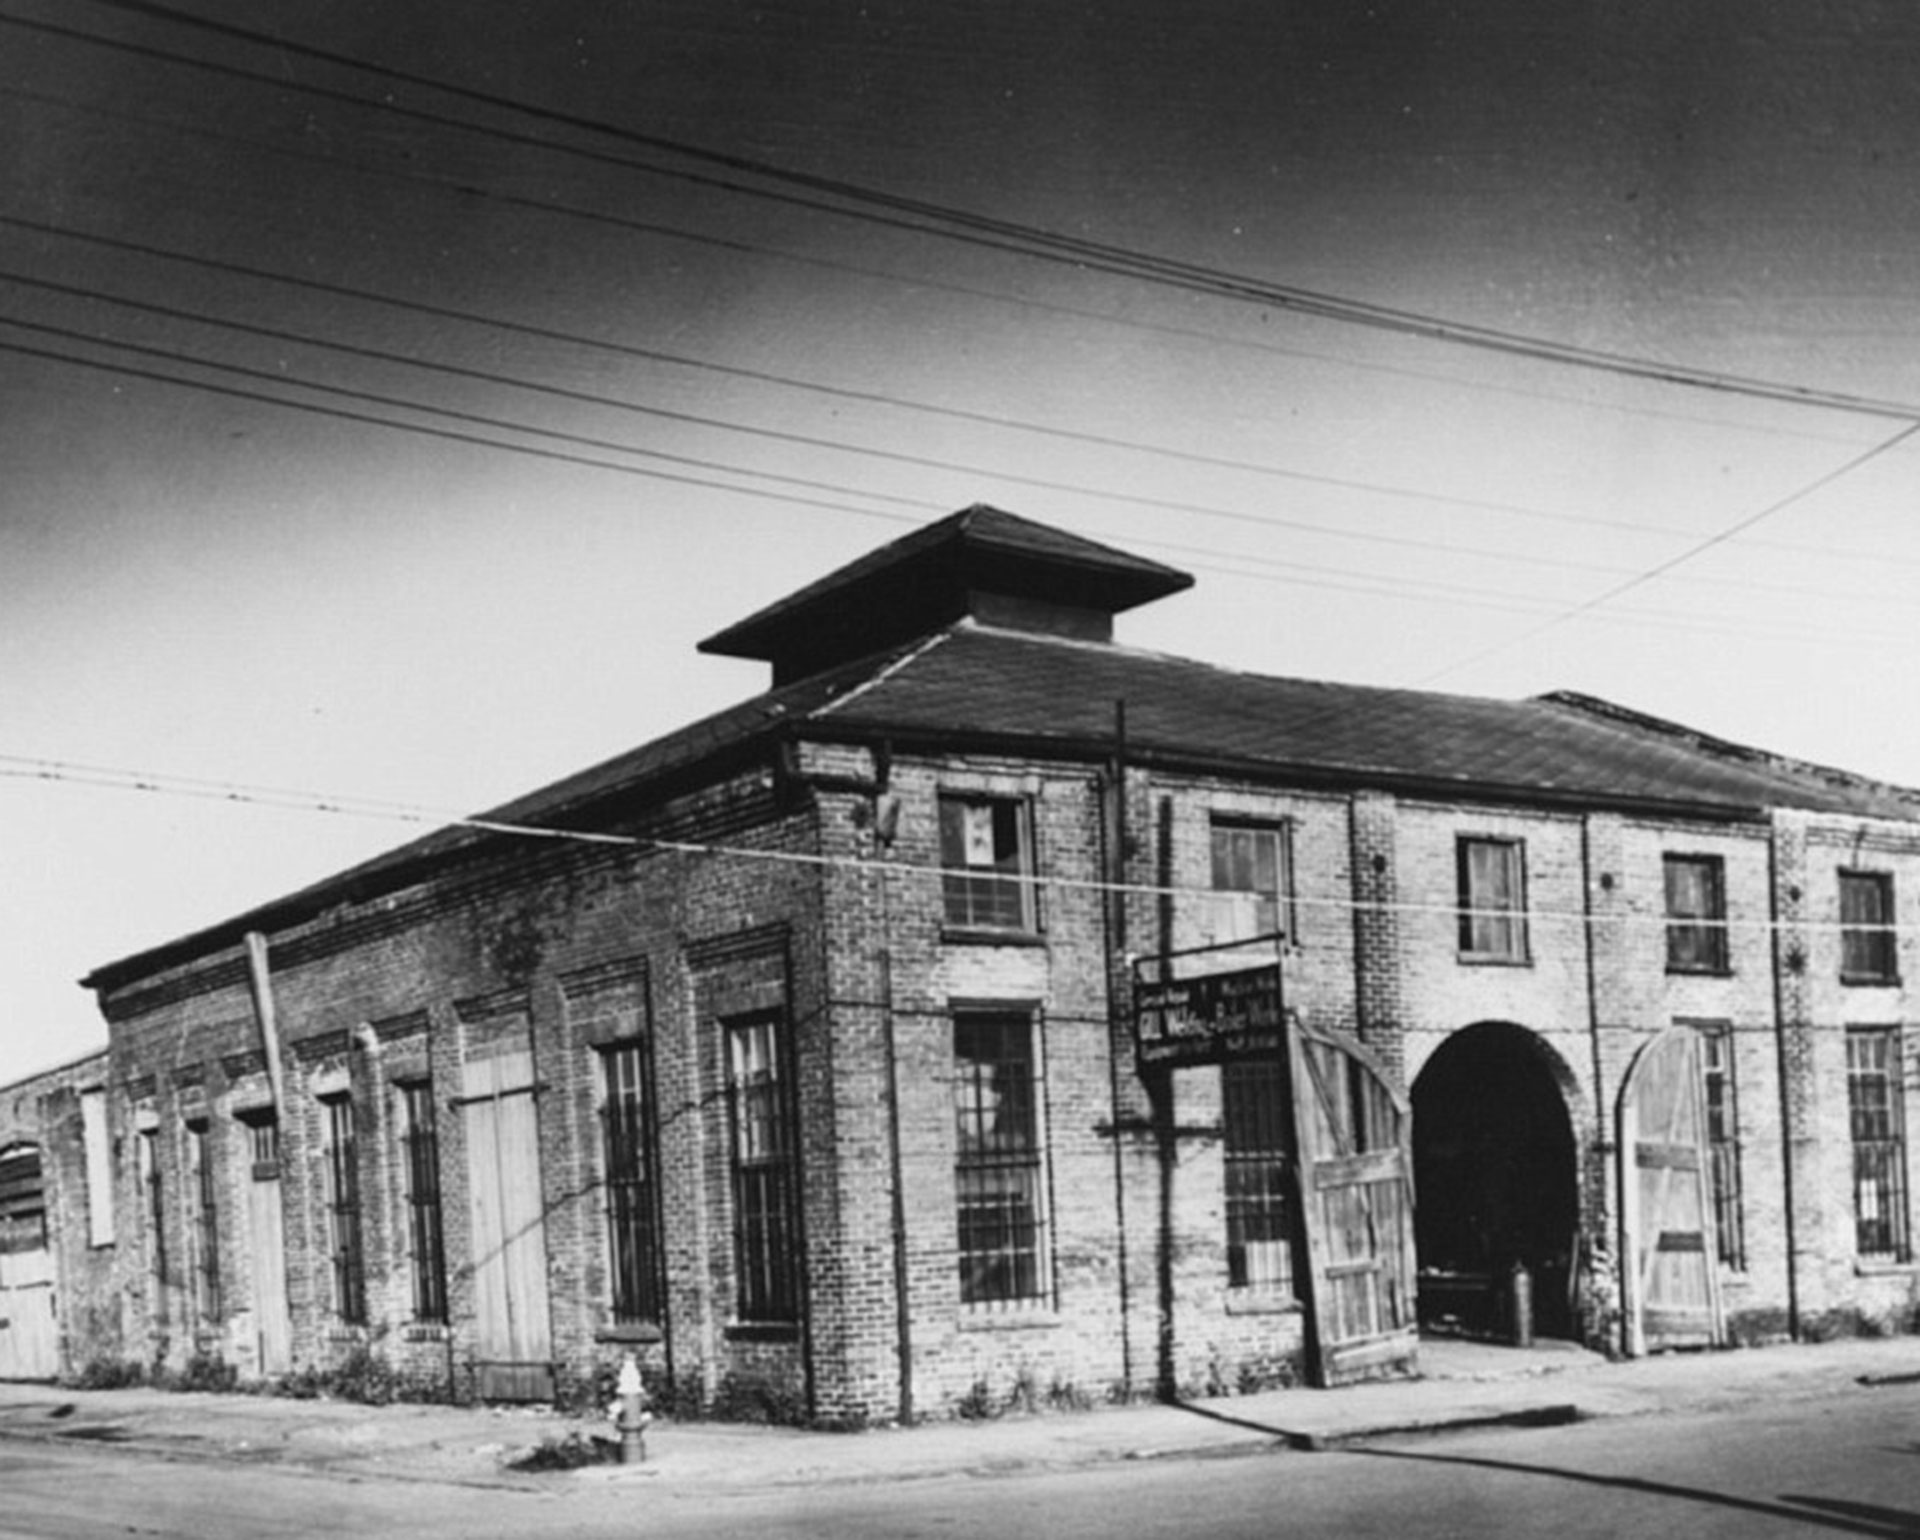 El taller Park and Lyons en Mobile, Alabama, donde se construyó el Hunley (Naval History and Heritage Command)